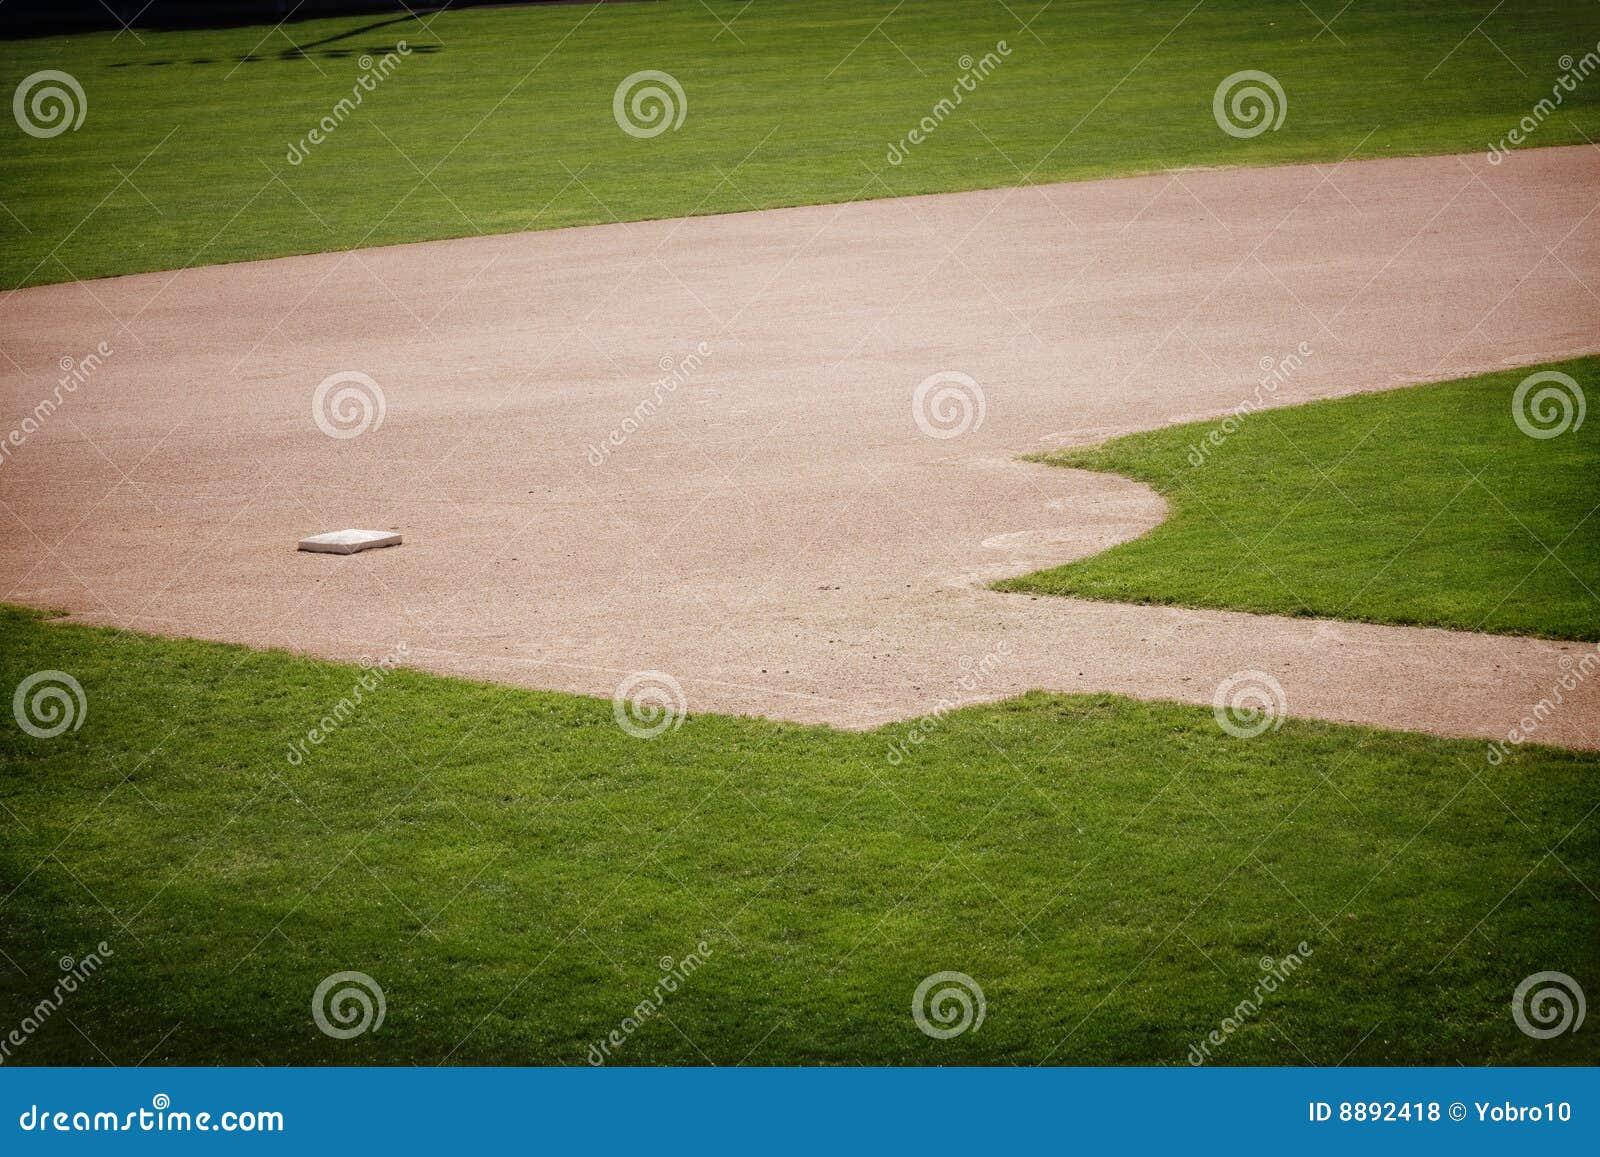 baseball field background stock photo  image of american